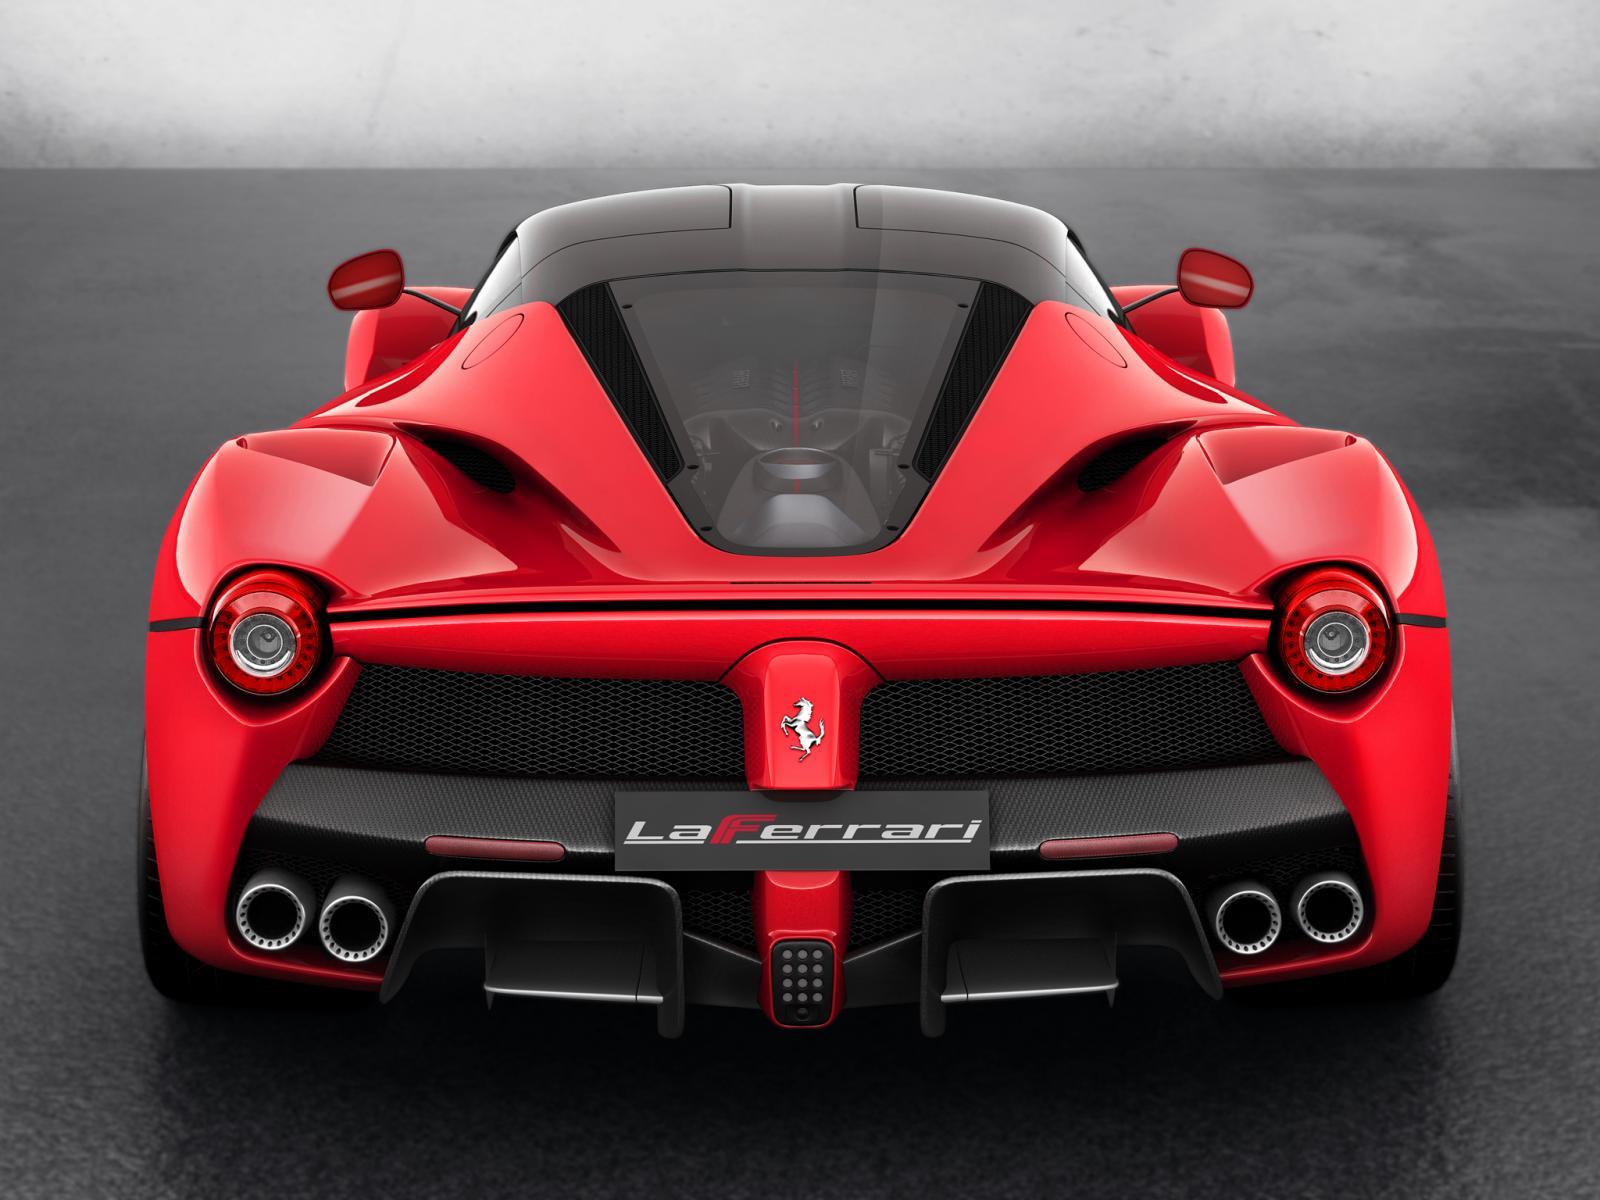 Ferrari f150 enzo replacement image collections hd cars wallpaper 2013 ferrari enzo f70 choice image hd cars wallpaper ferrari f150 enzo replacement images hd cars vanachro Choice Image